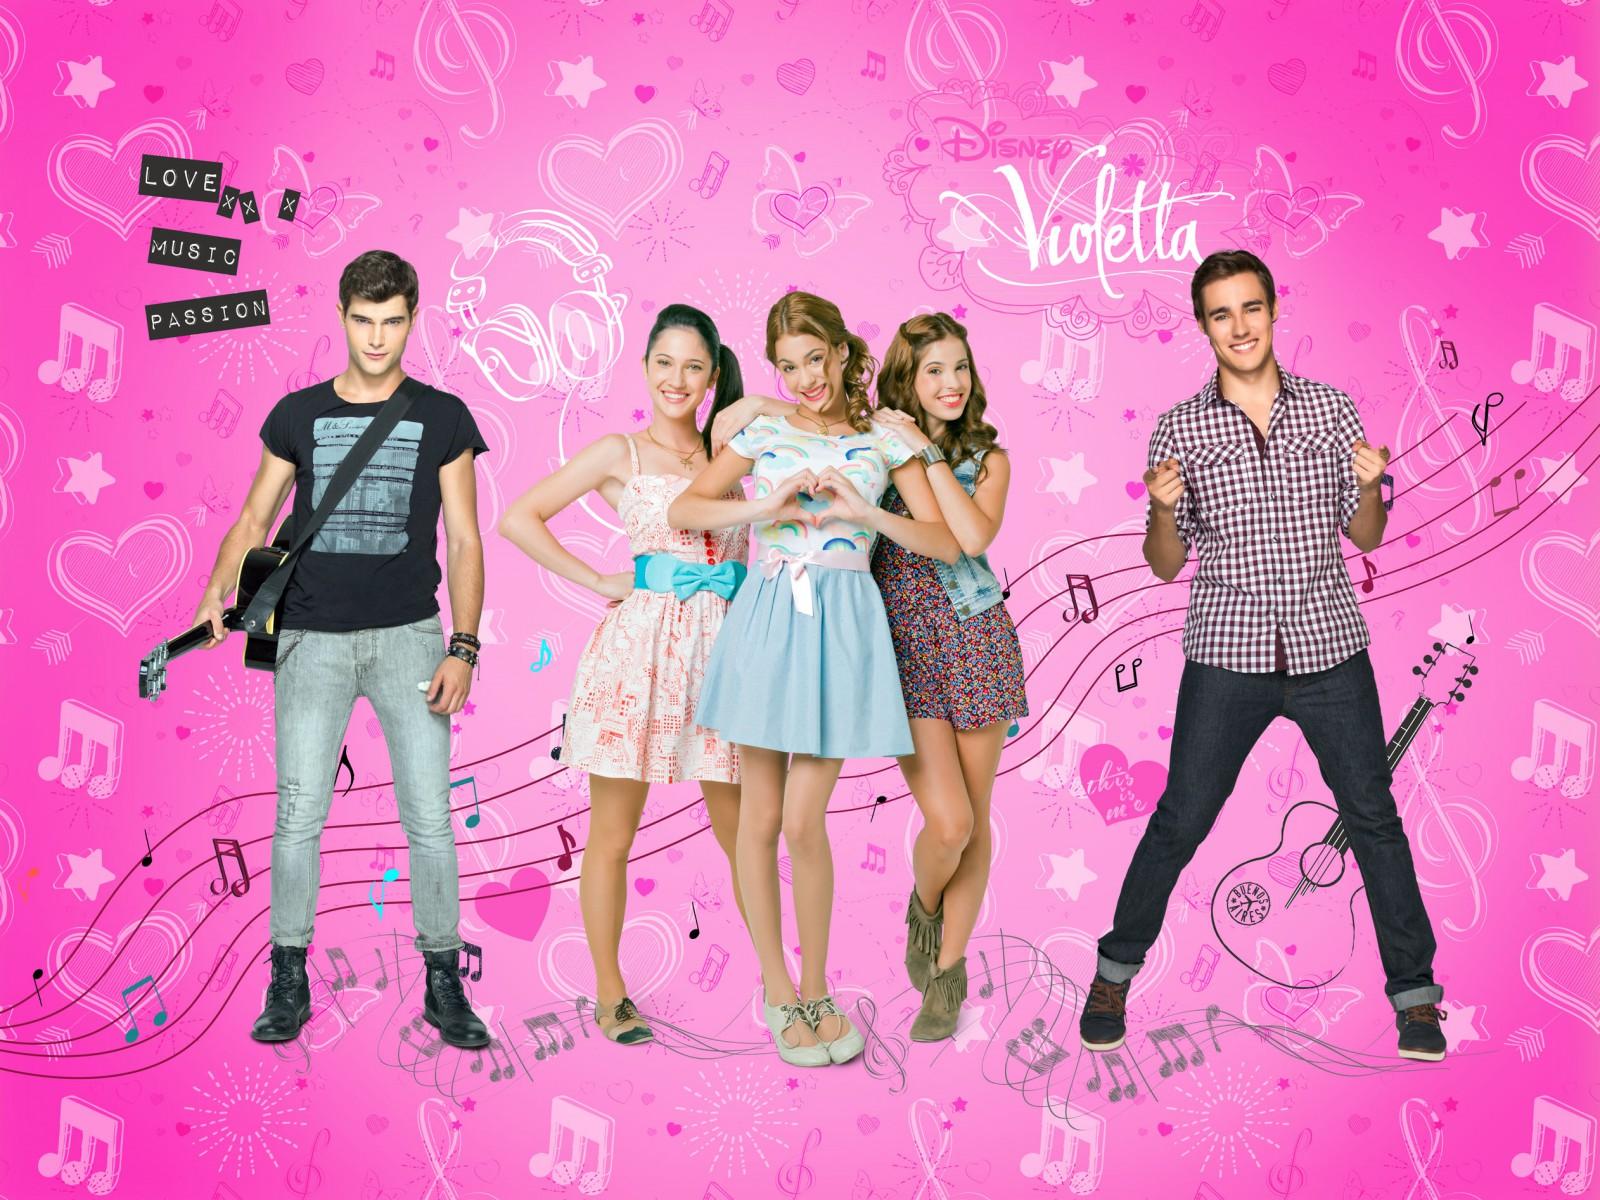 XXL Photo Wallpaper Mural Disney Violetta Girls Kids 1600x1200